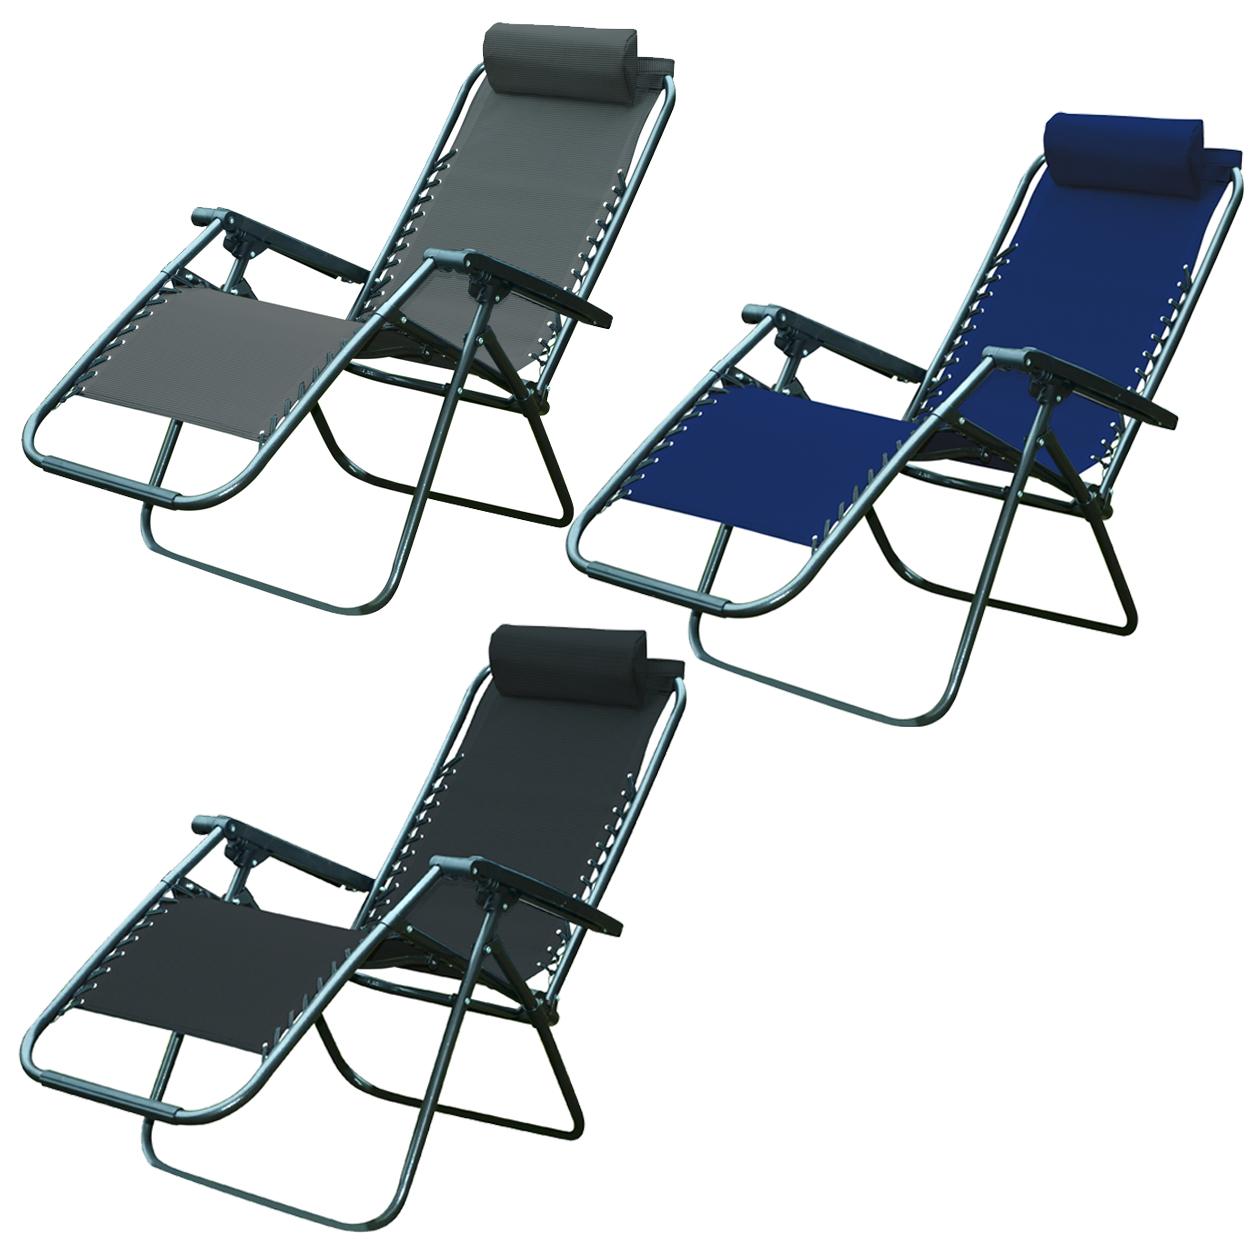 Textoline Garden Furniture Zero gravity folding reclining sun lounger textoline garden chairs home workwithnaturefo